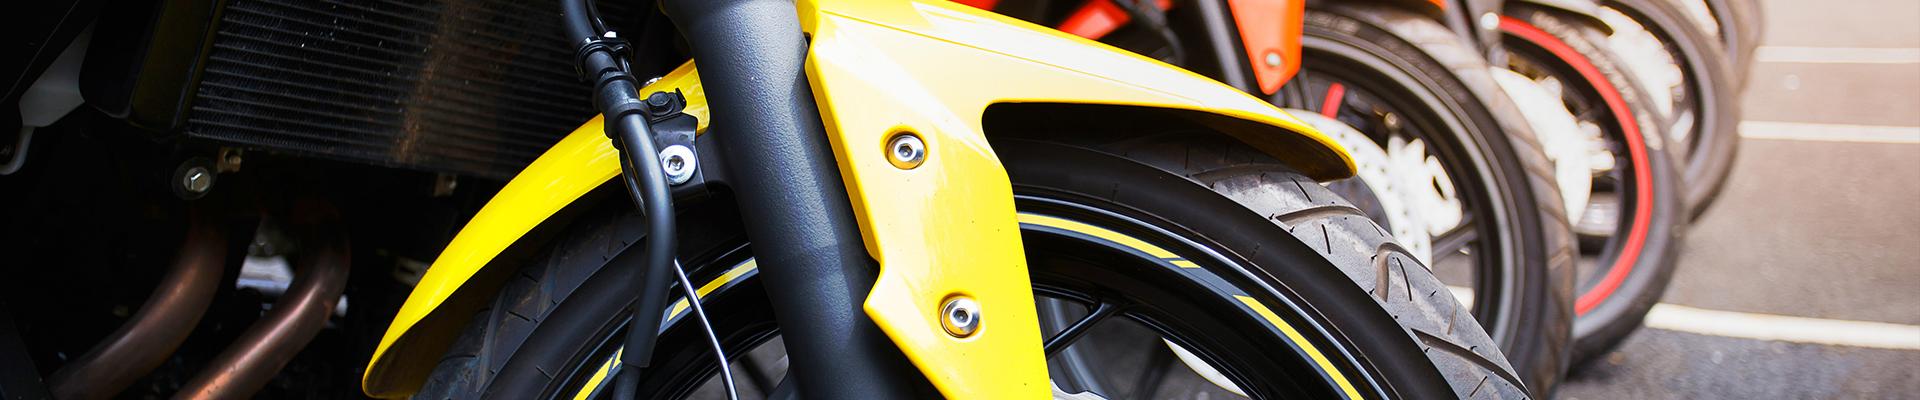 Final Touch Detail Car Detail services